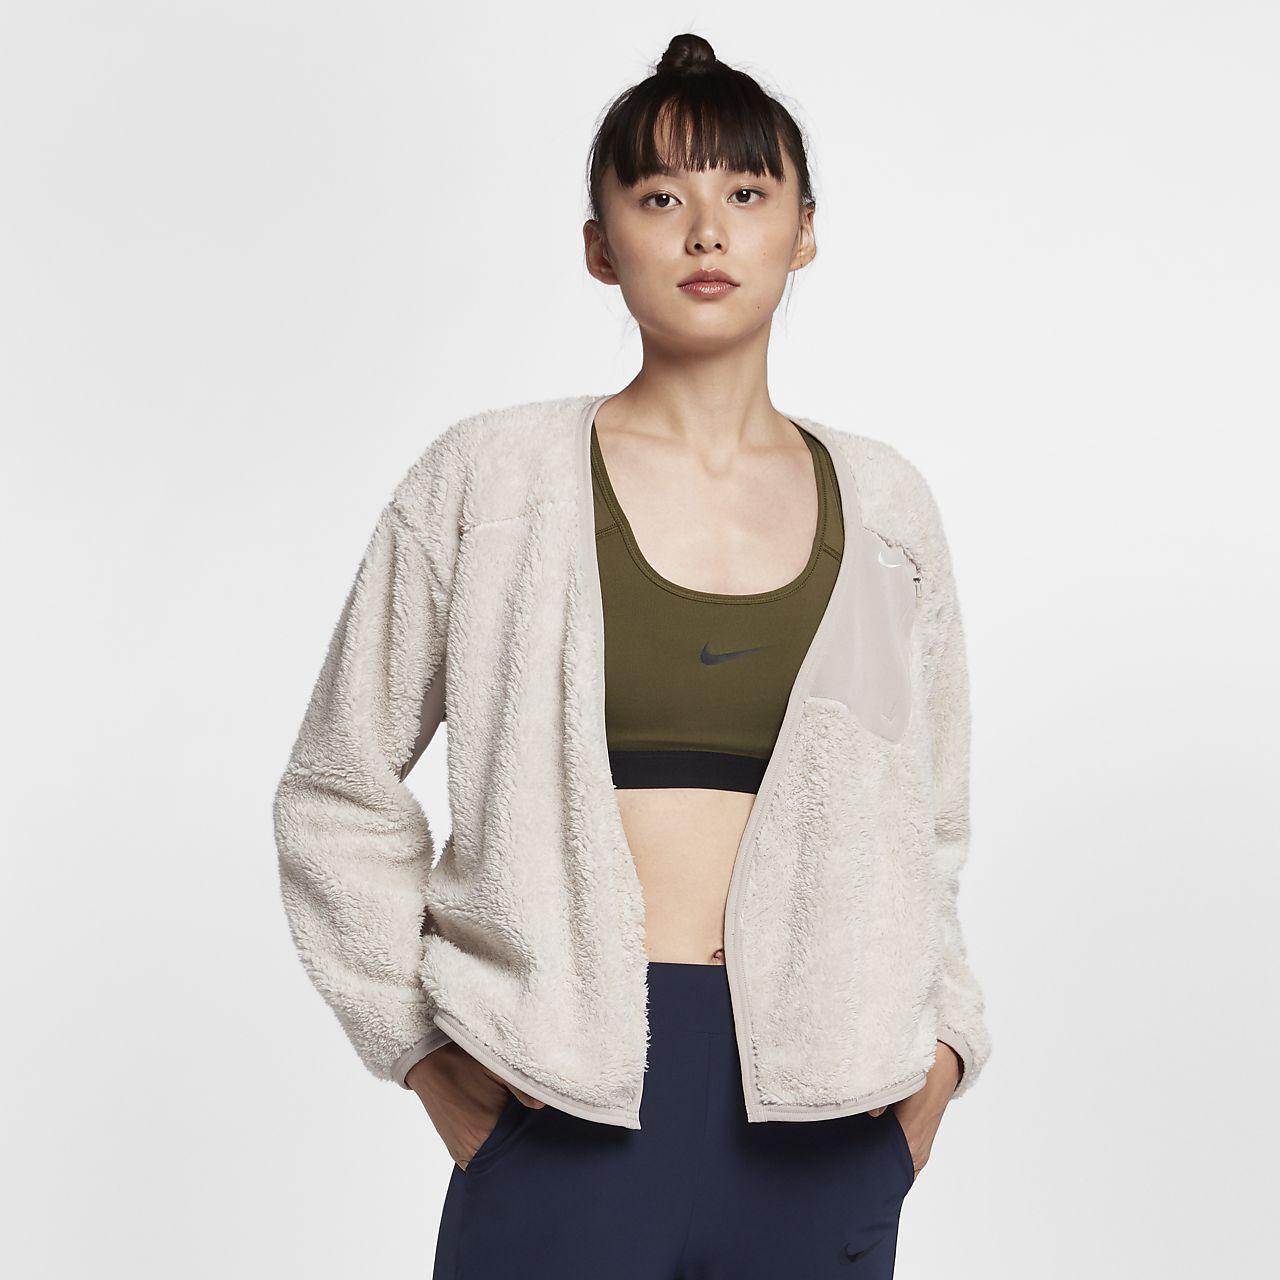 Nike Women's Long Sleeve Training Wrap